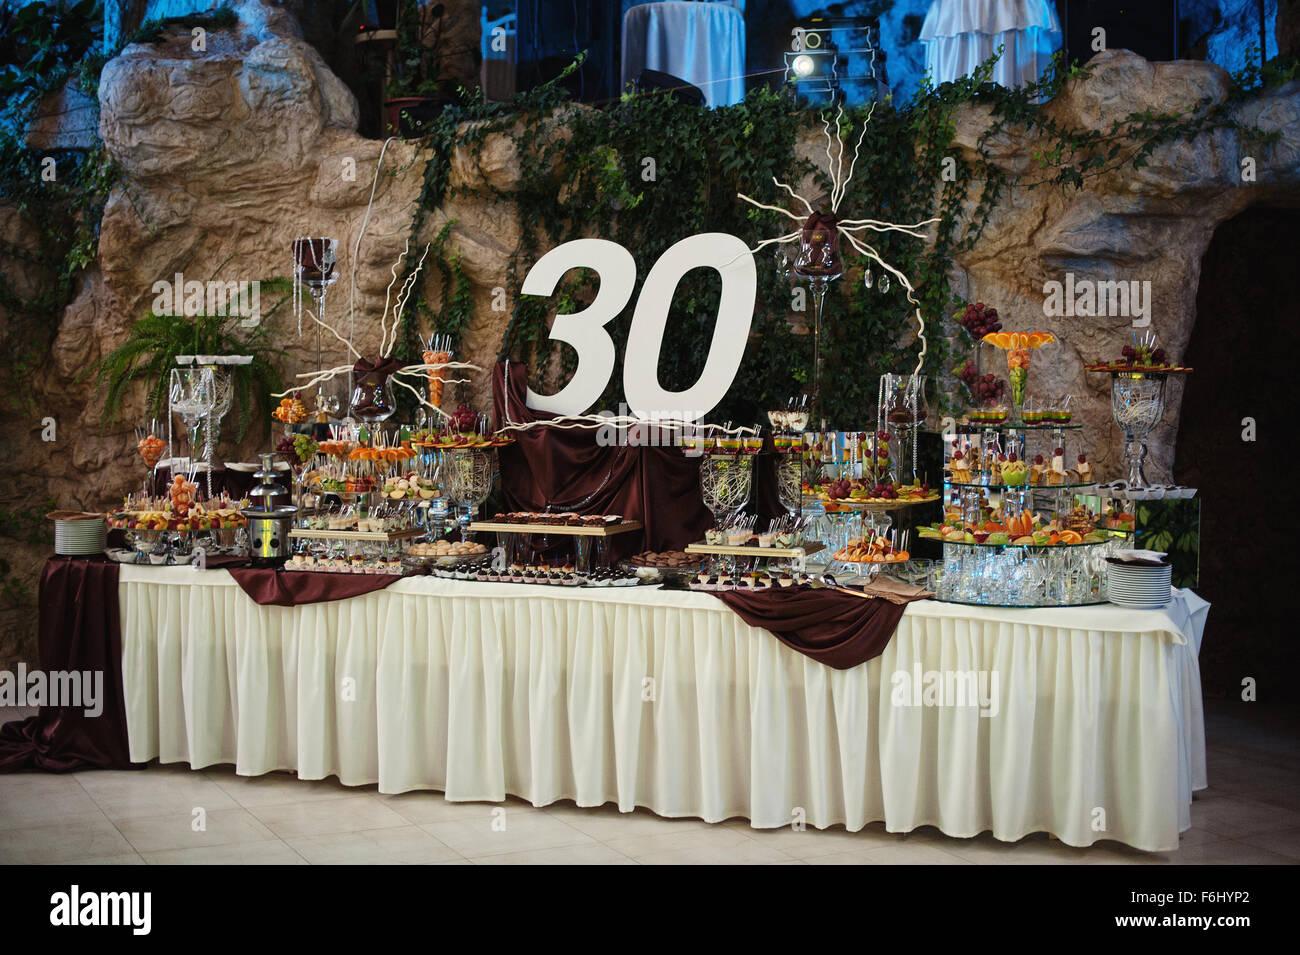 Geburtstag Tischdekoration 30 Jubilaum Stockfoto Bild 90134746